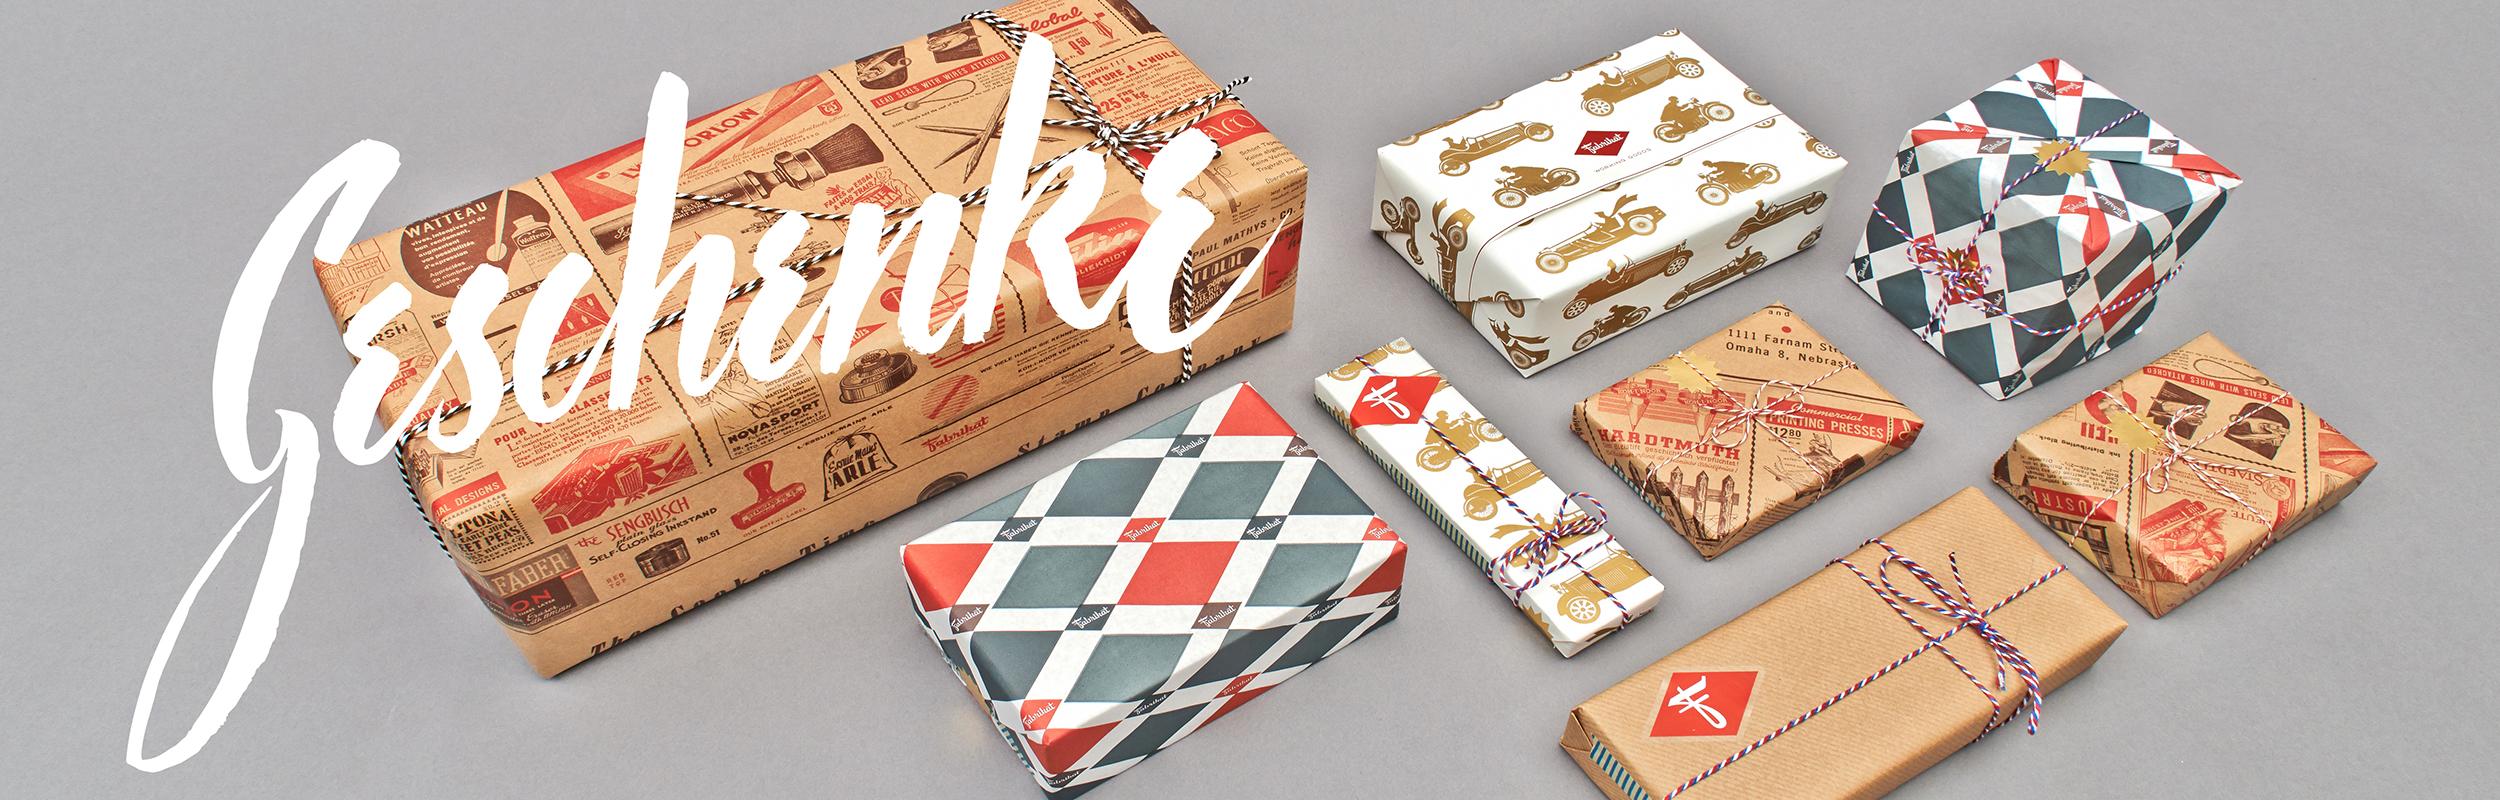 Geschenkpapier & Karten